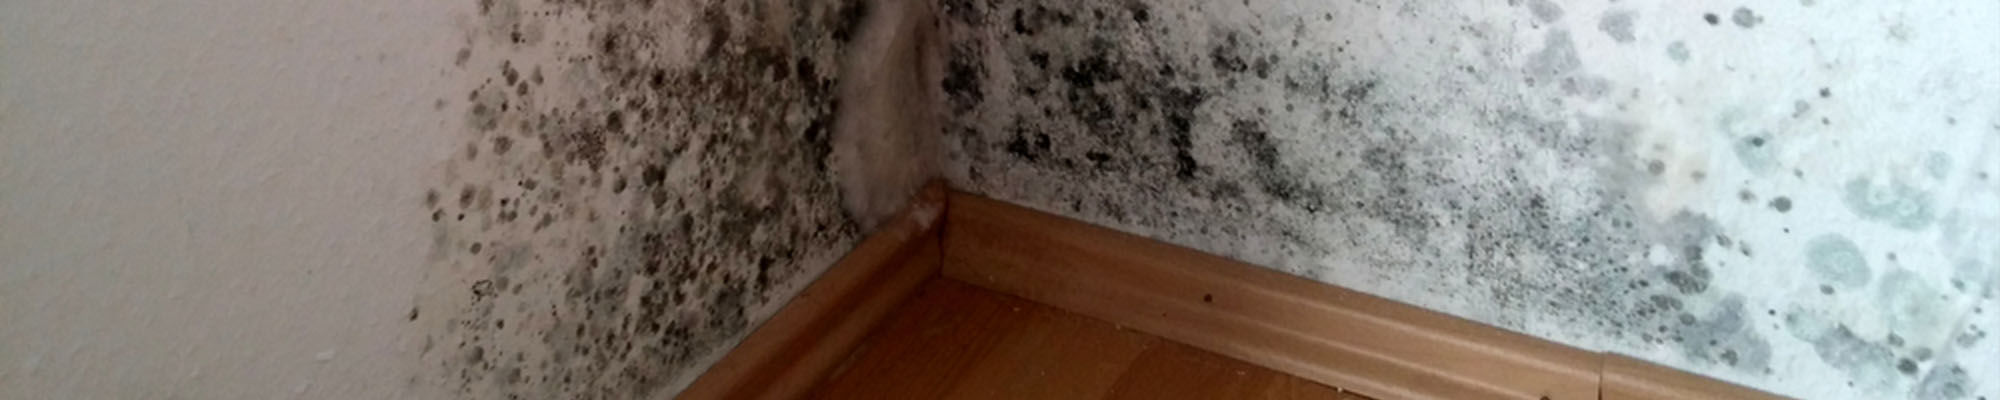 Condensation & black mould in room corner